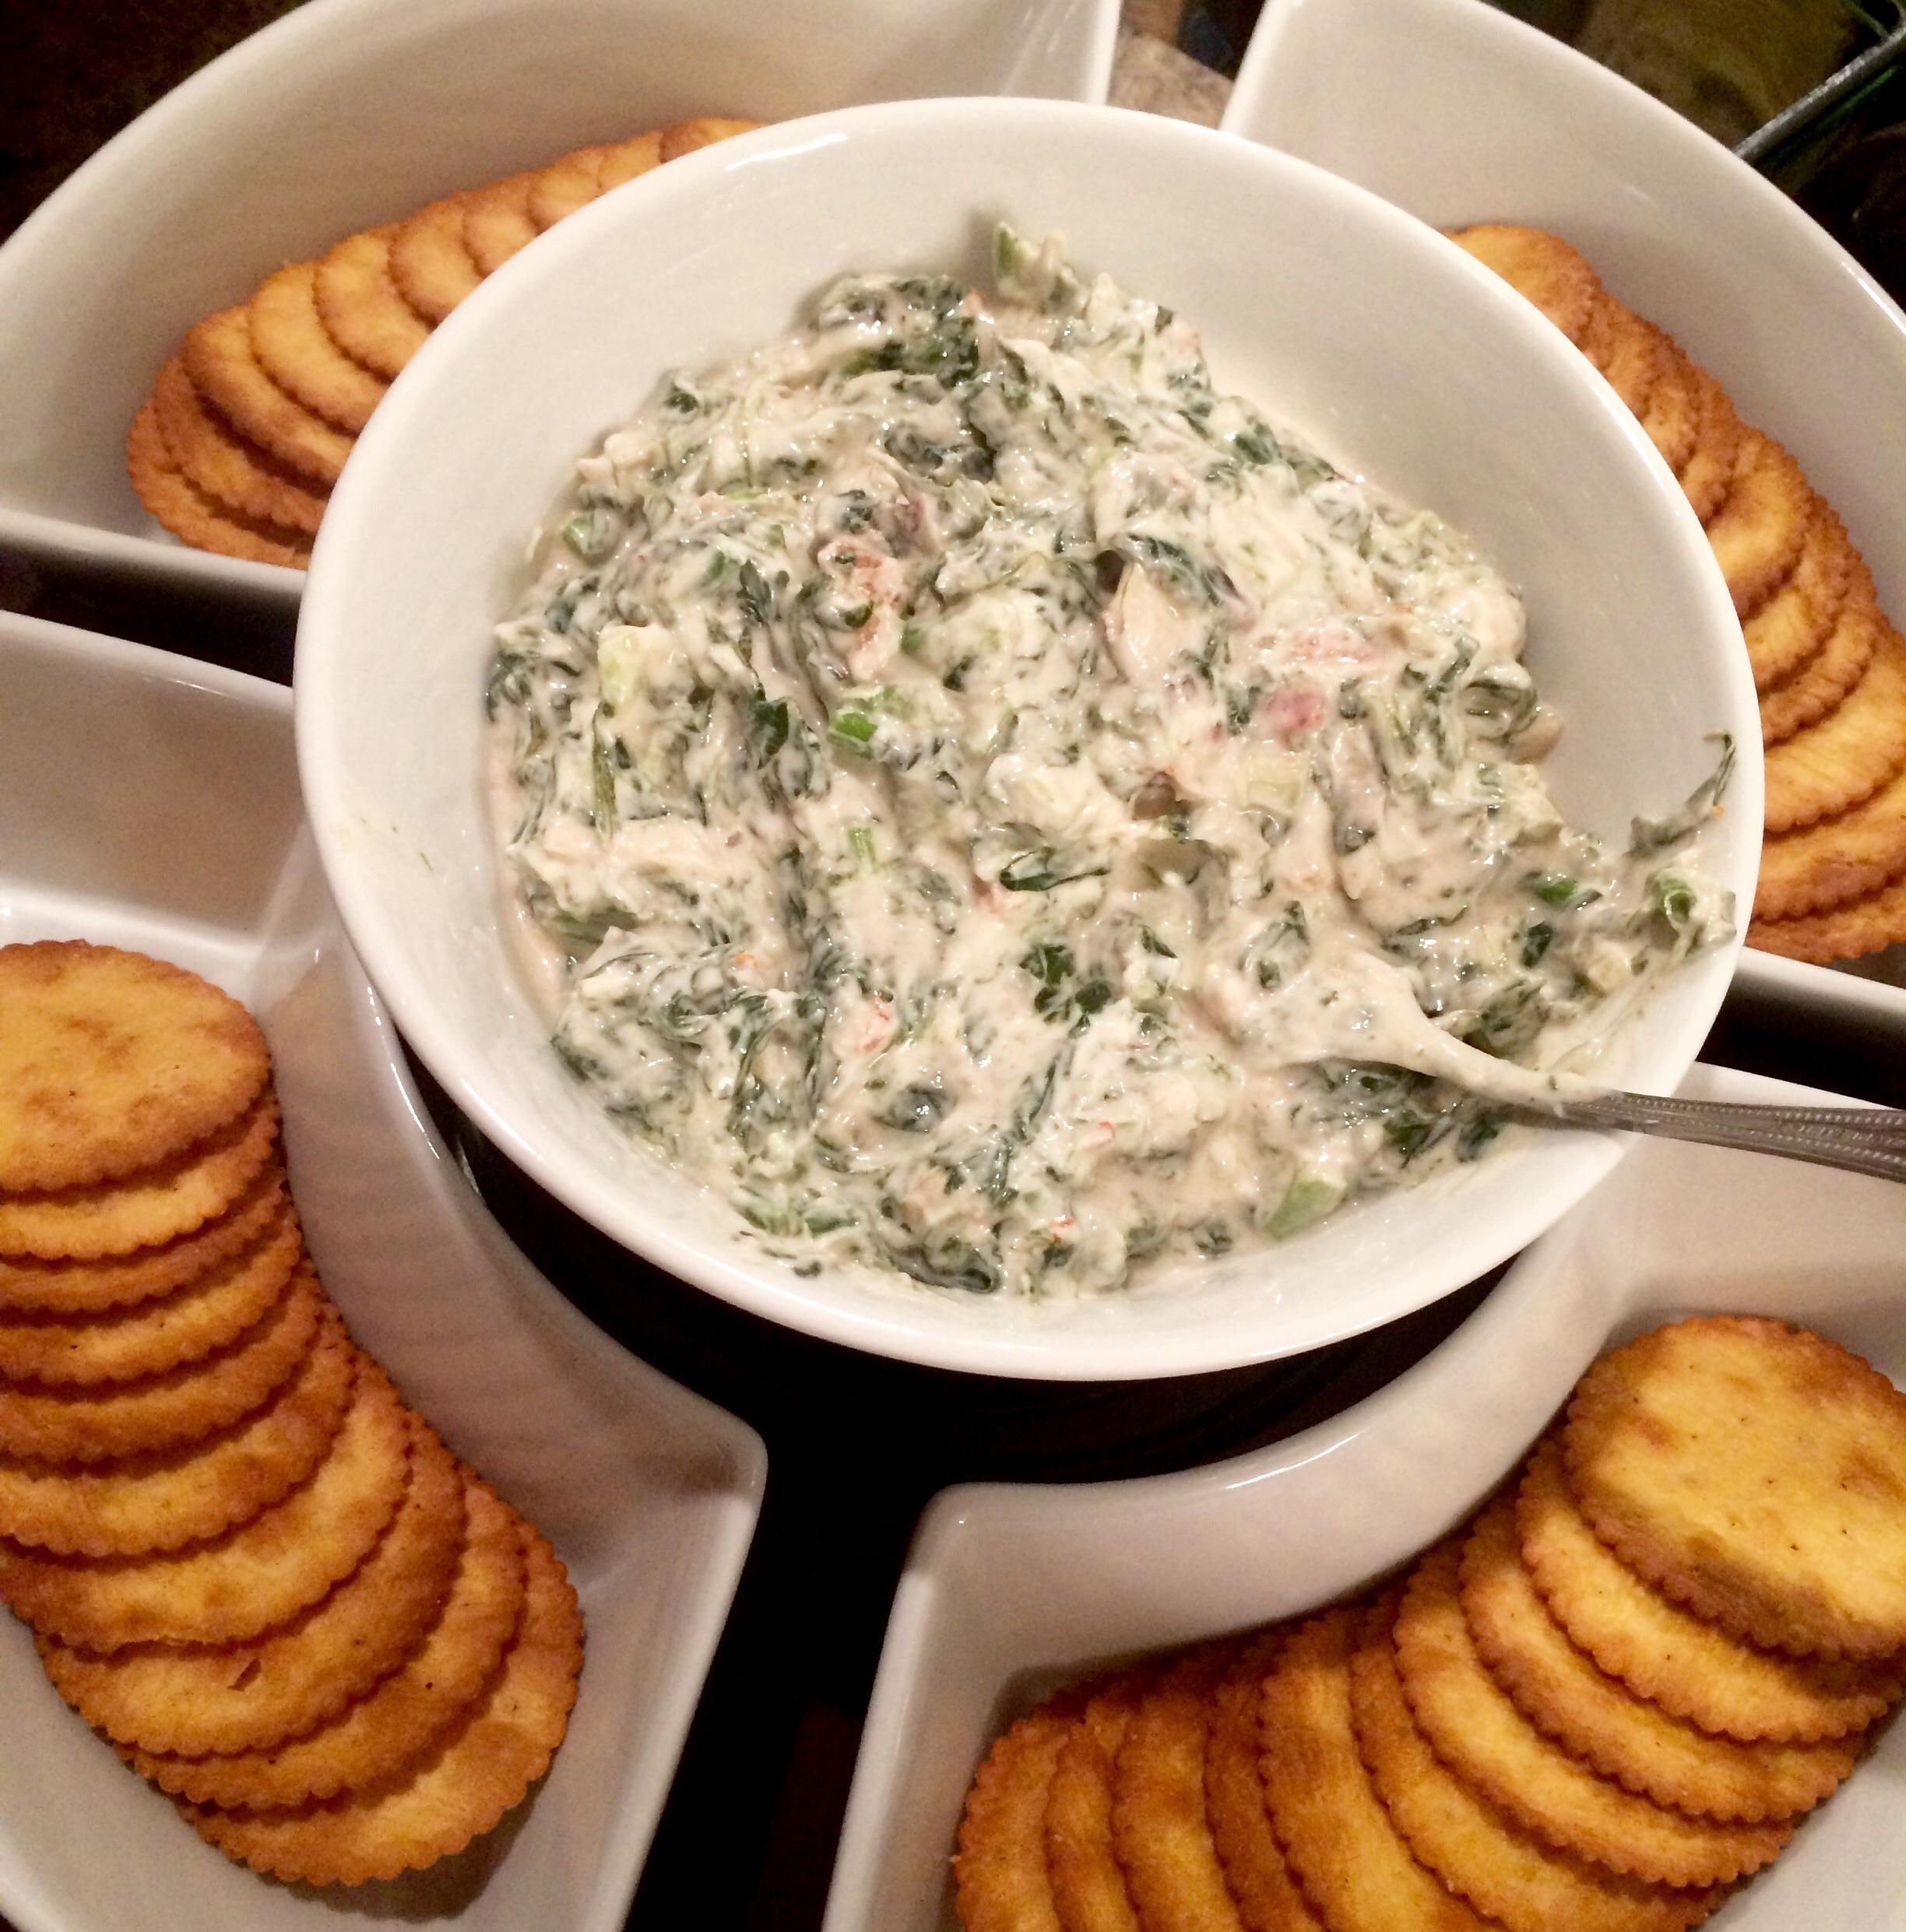 Spinach & Kale Greek Yogurt Dip